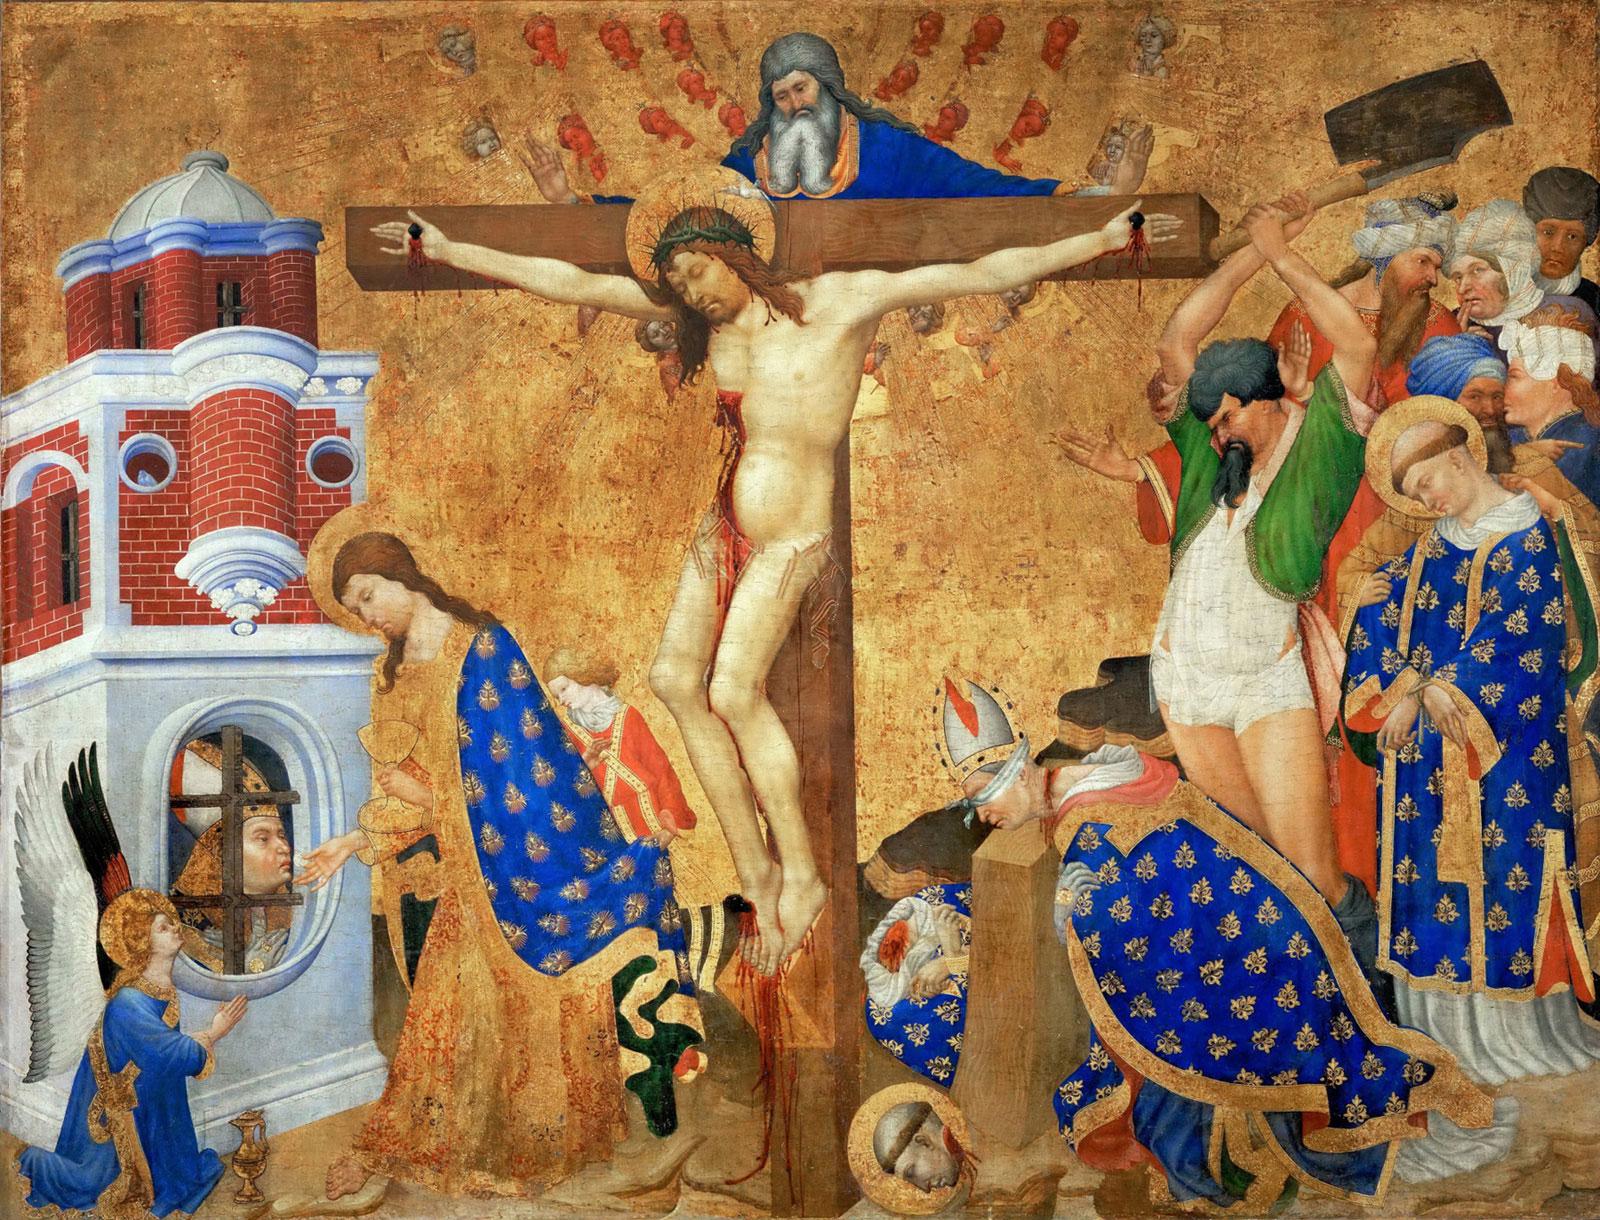 Altarpiece: Martyrdom of St. Denis by Henri Bellechose